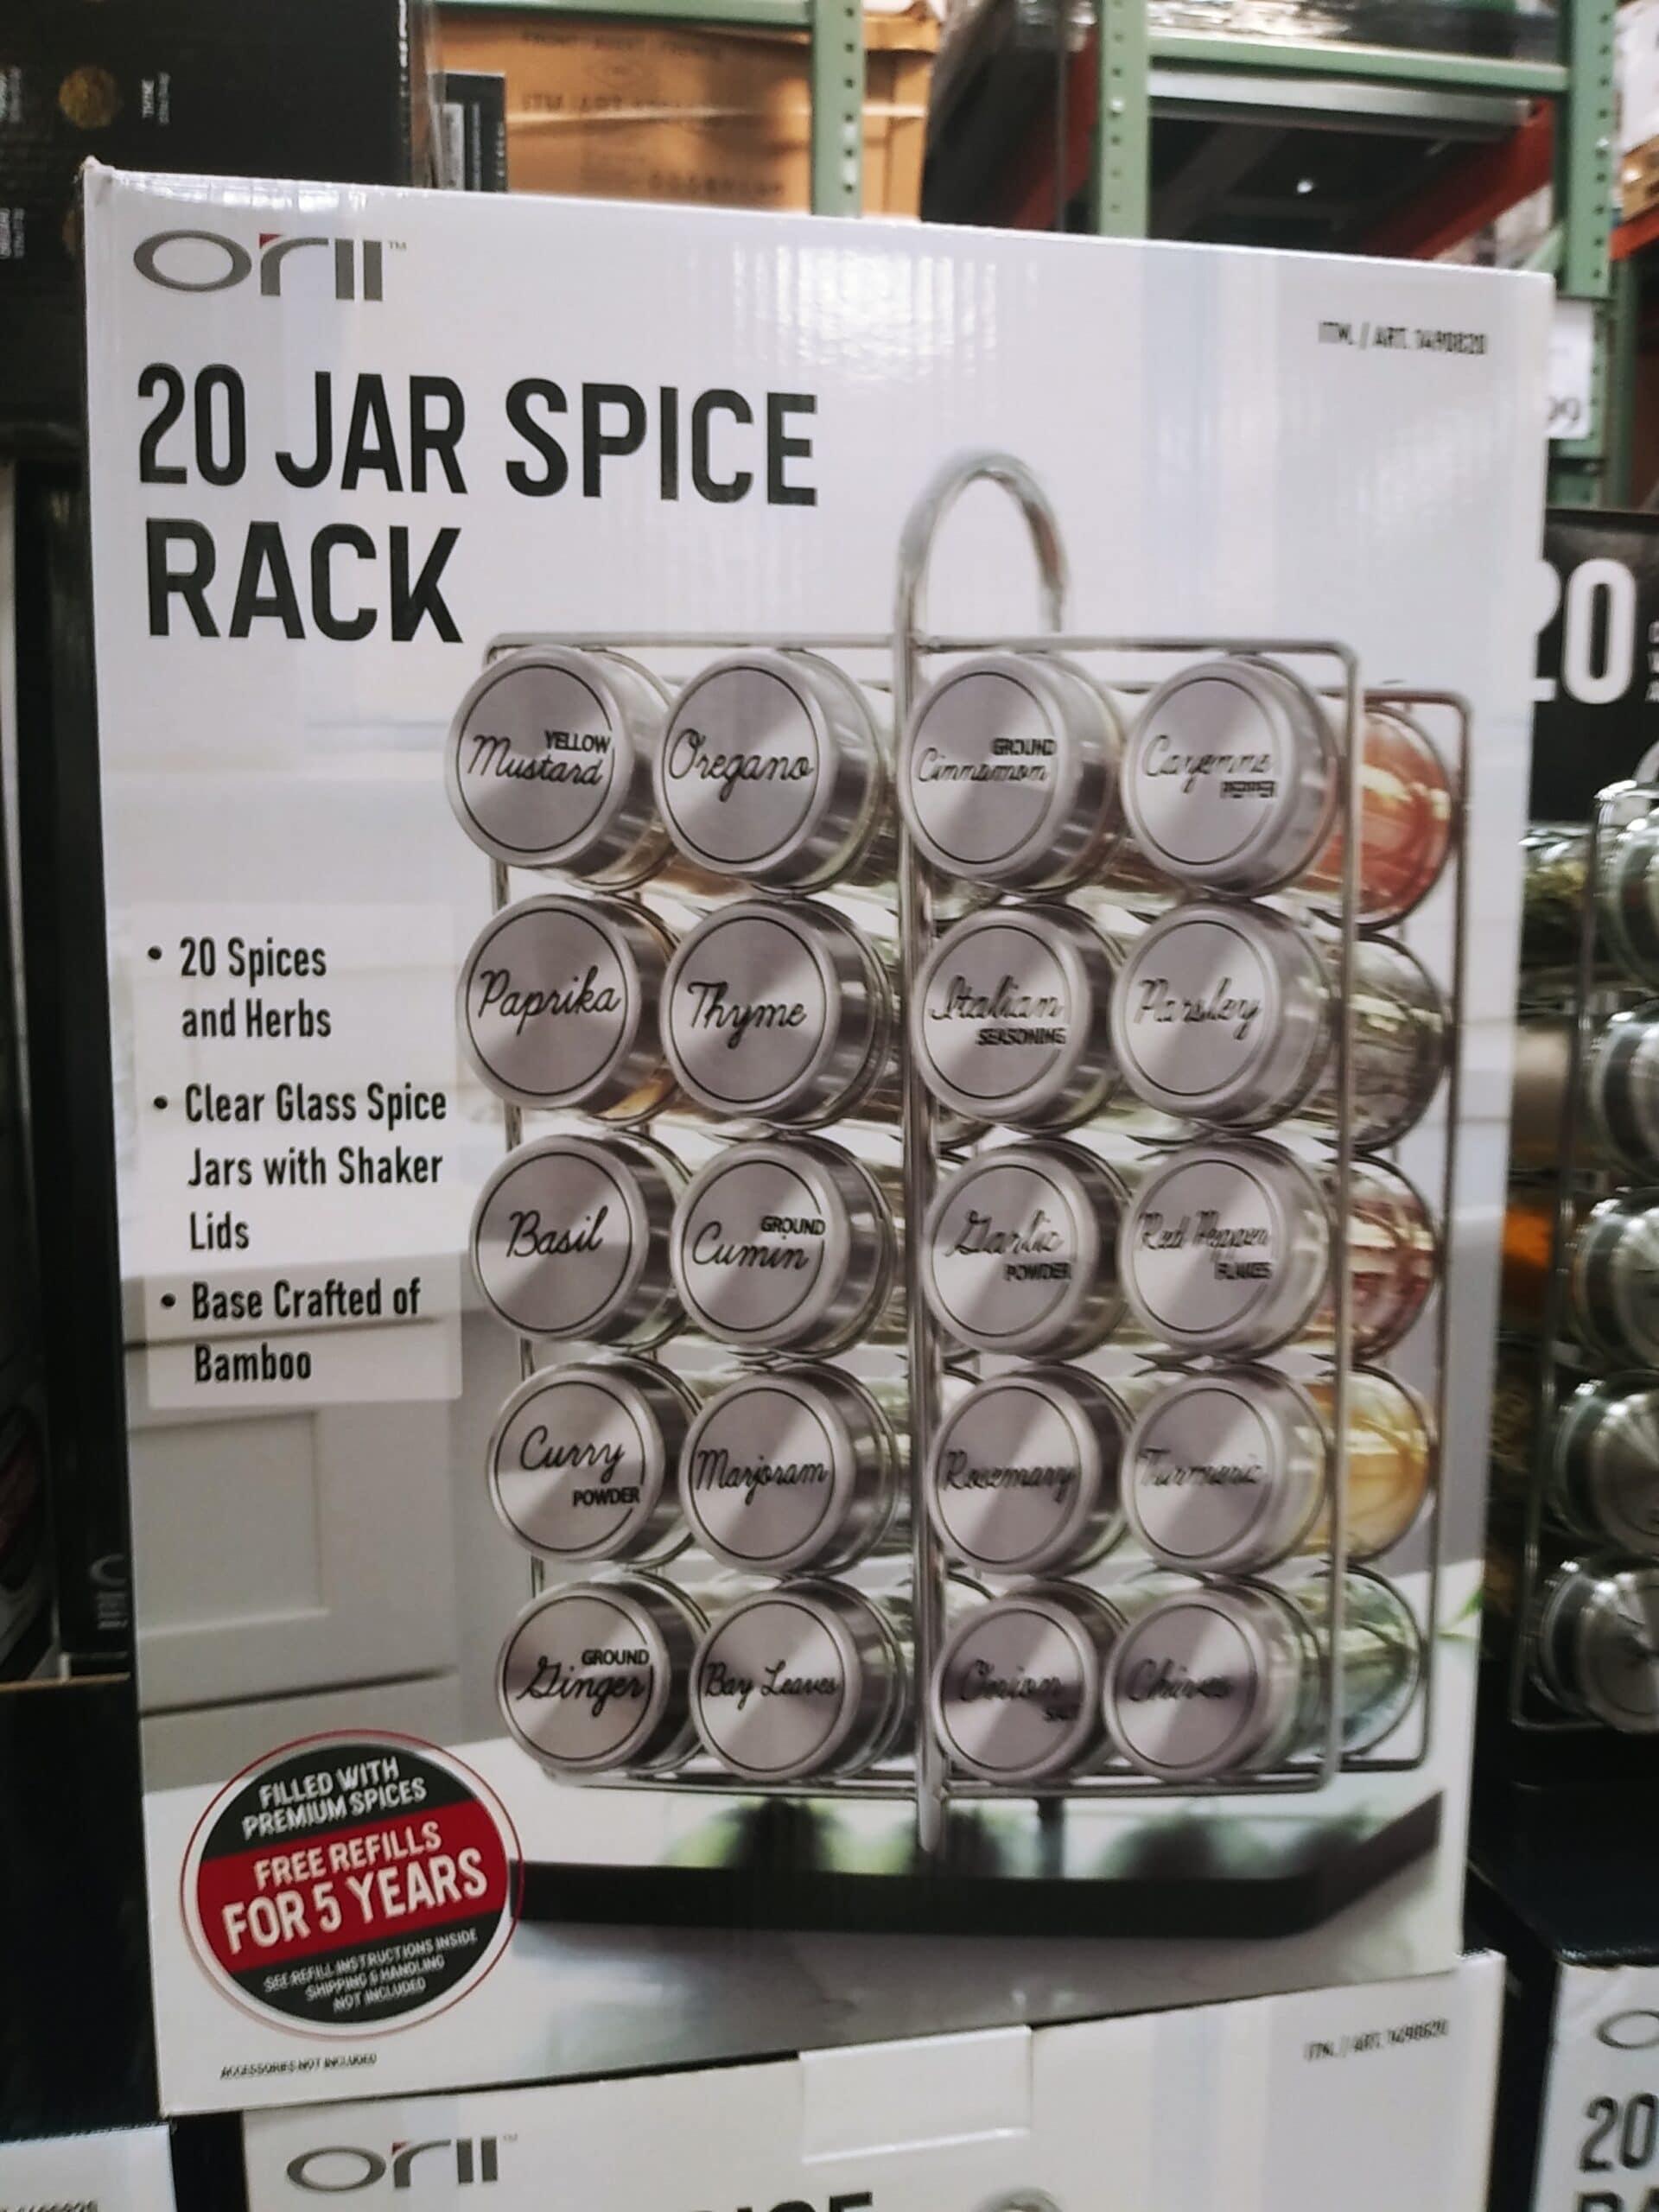 Orii 20 Jar Spice Rack $29.99